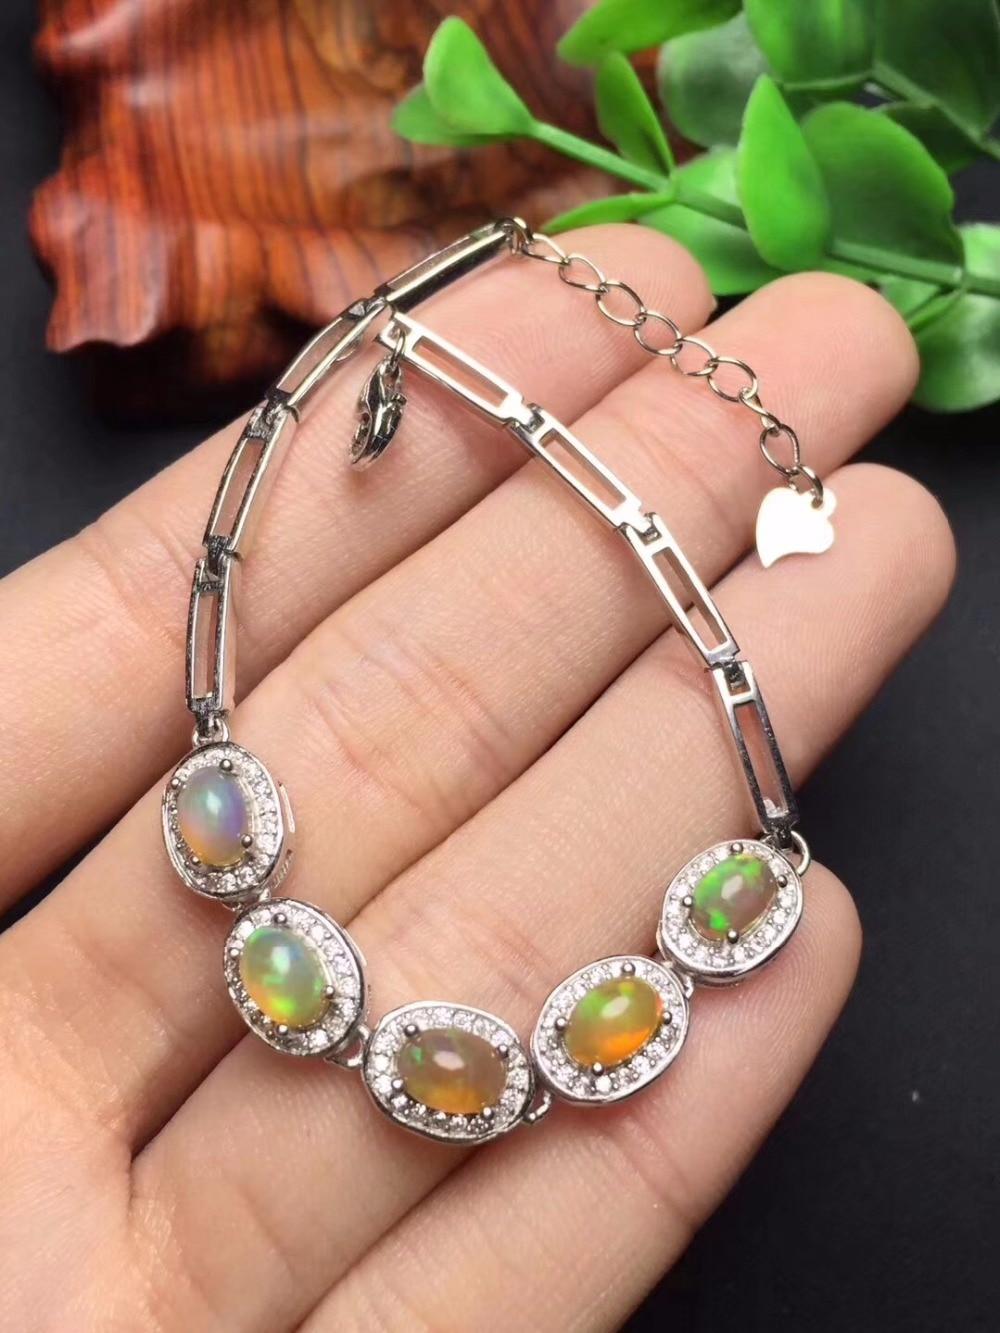 Fine Jewelry Real 925 Steling Silver s925 100% Natural Opal Gemstone Leopard Unisex Bracelets Christmas Gift